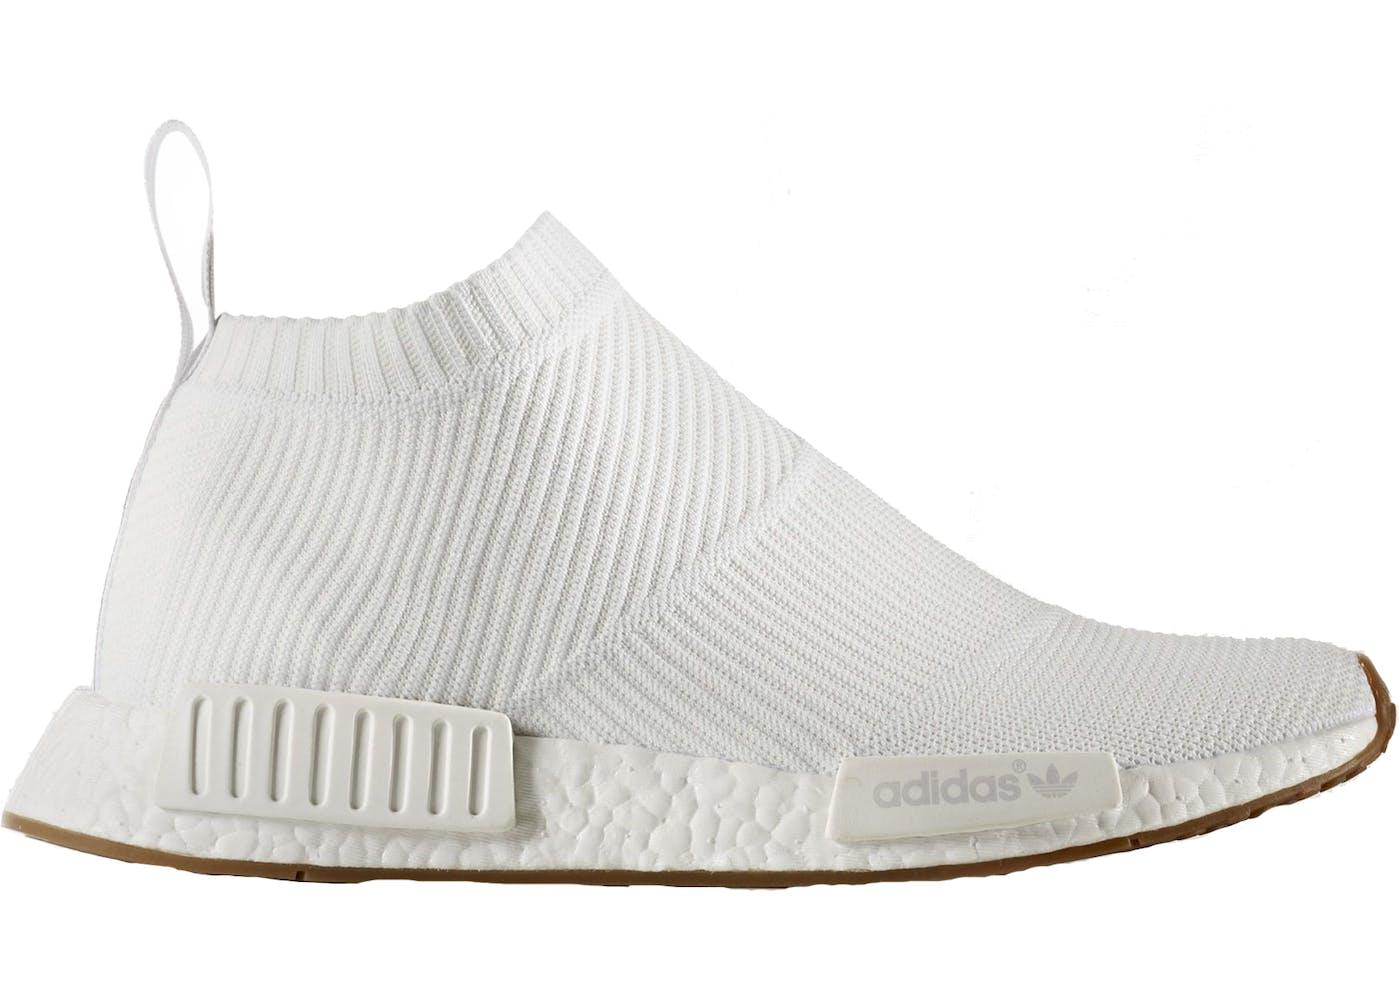 c8e3d0a2774c1 Adidas NMD CS2 Primeknit size 6 men s  8 women s. Grey White Pink